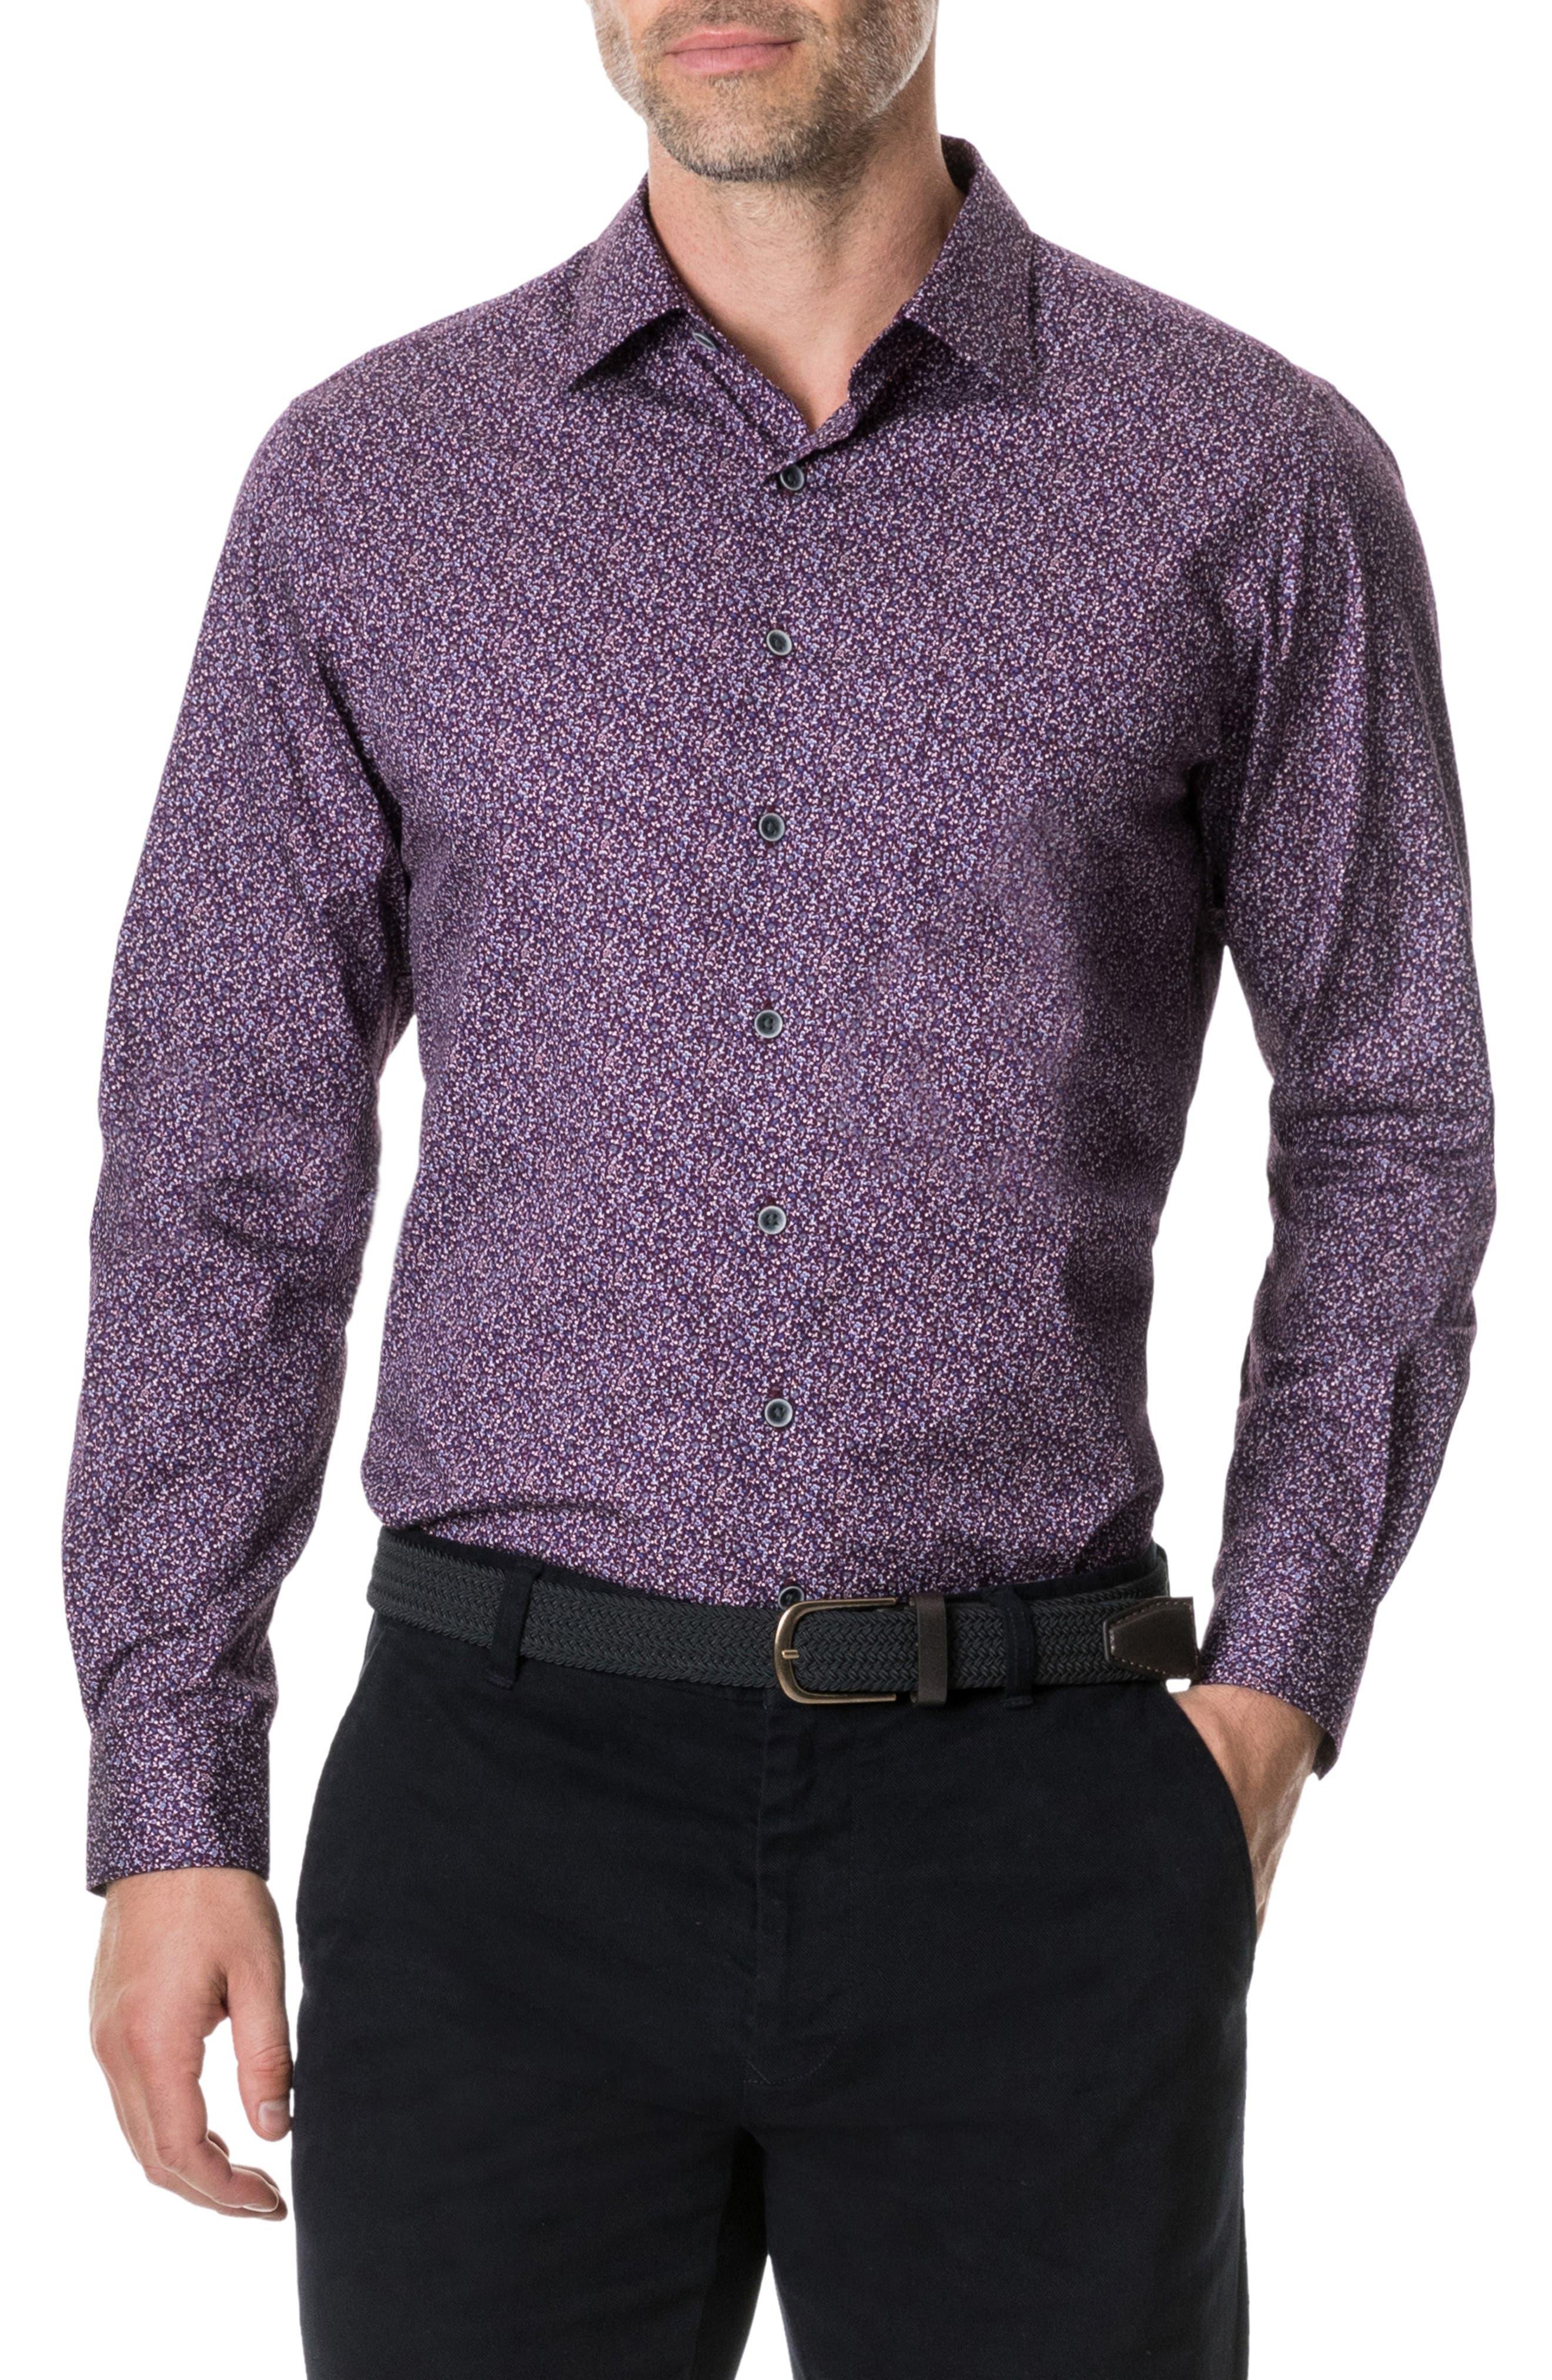 Scotland Street Regular Fit Floral Sport Shirt,                         Main,                         color, PLUM PURPLE